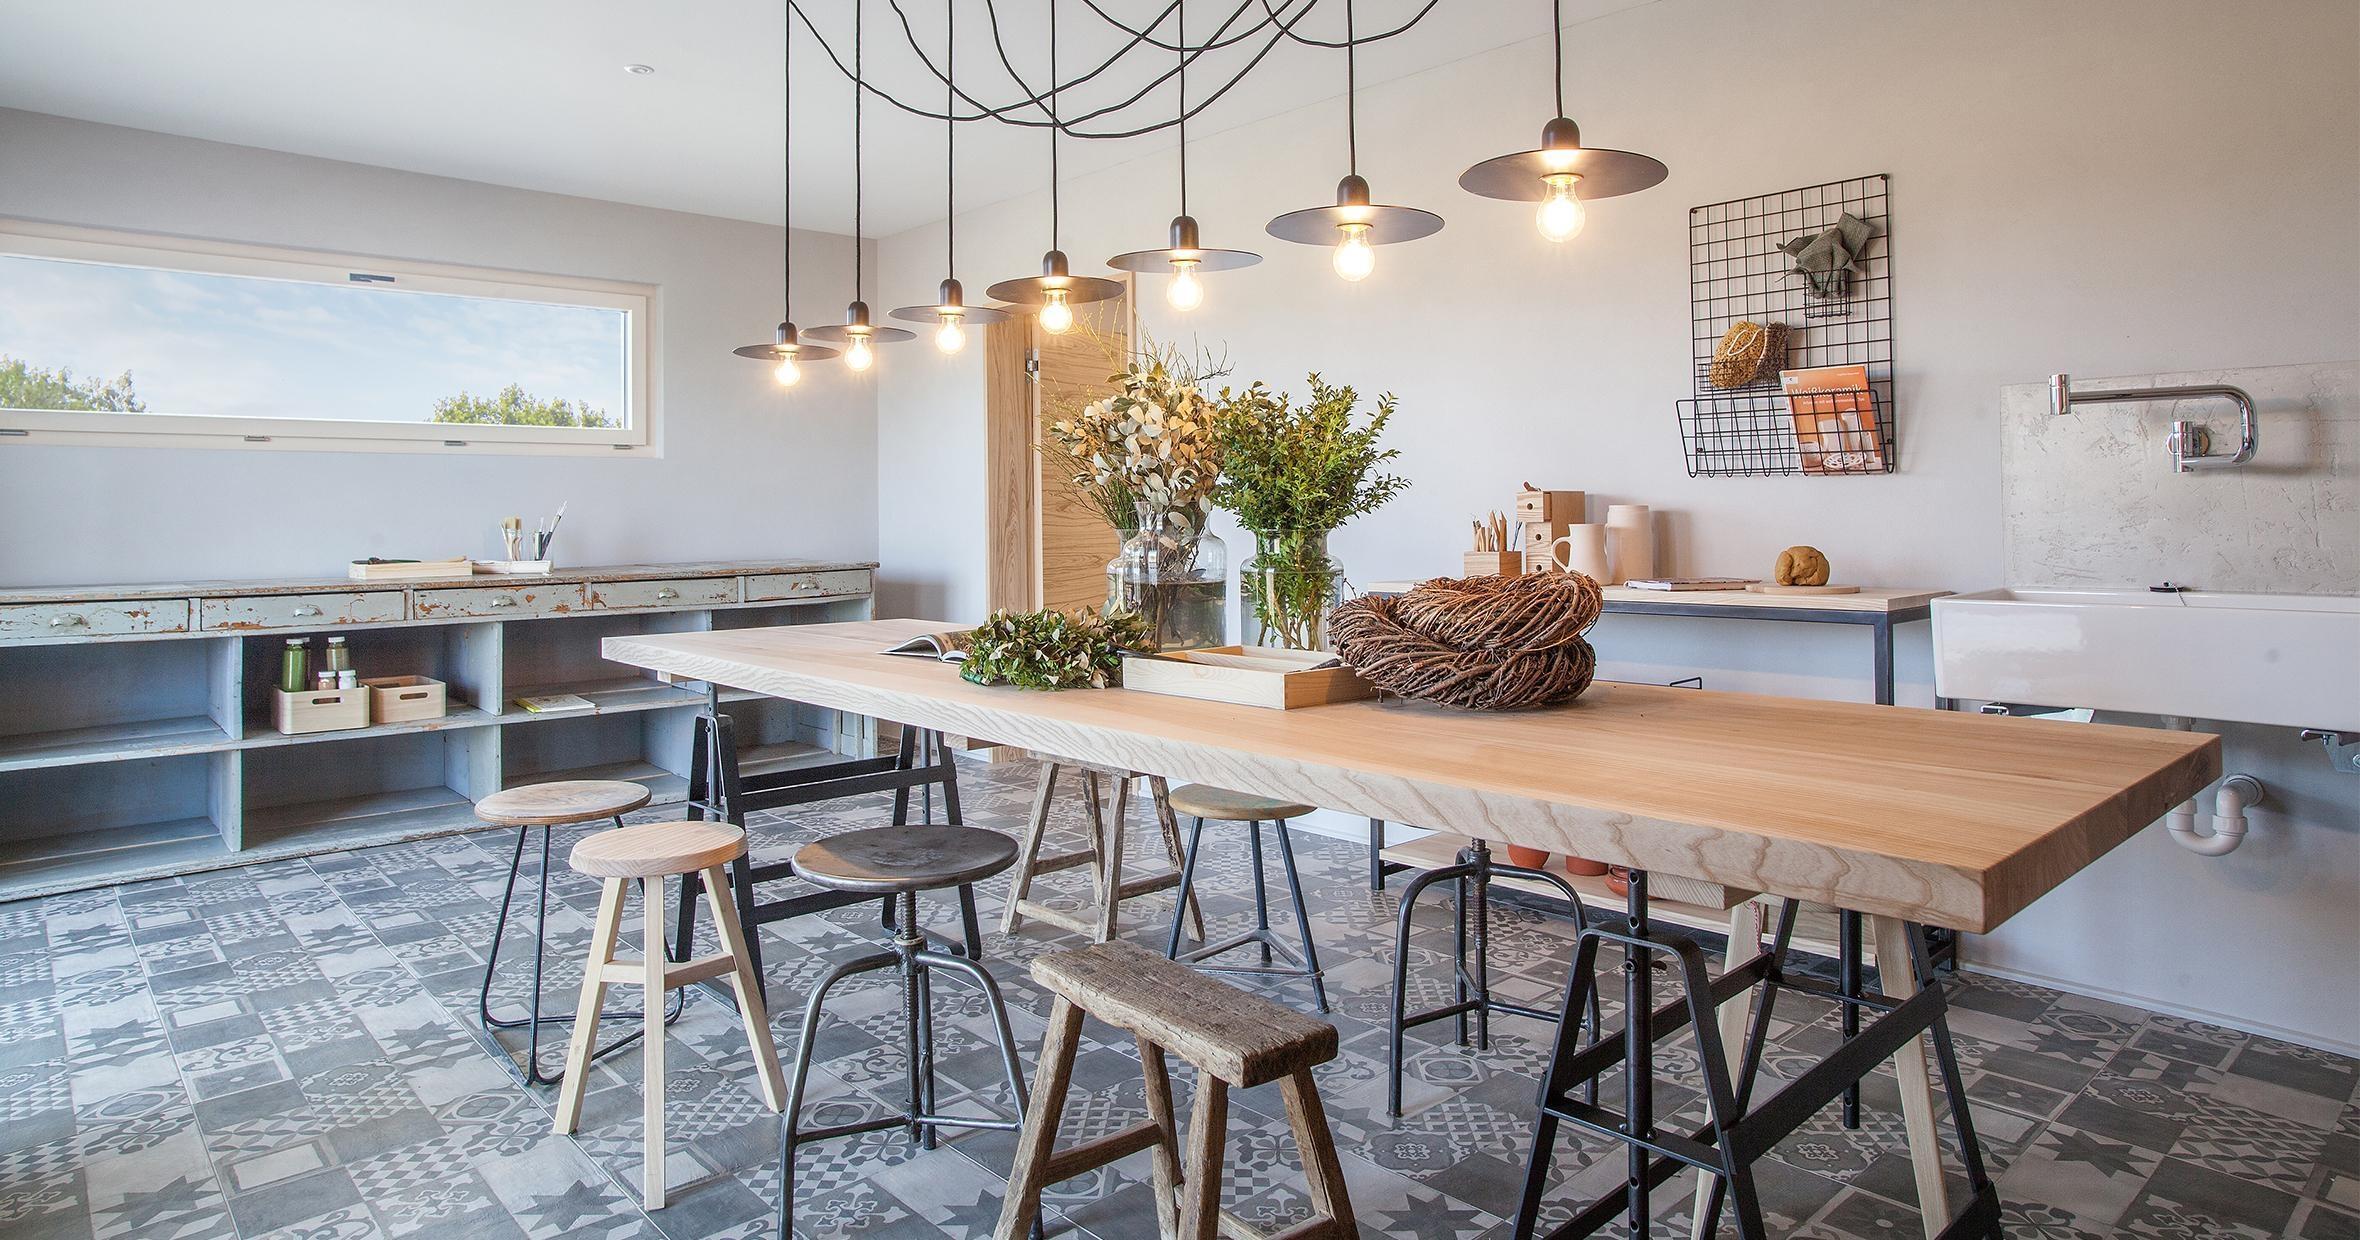 holzhaus inspiration einrichtungsideen bei couch. Black Bedroom Furniture Sets. Home Design Ideas